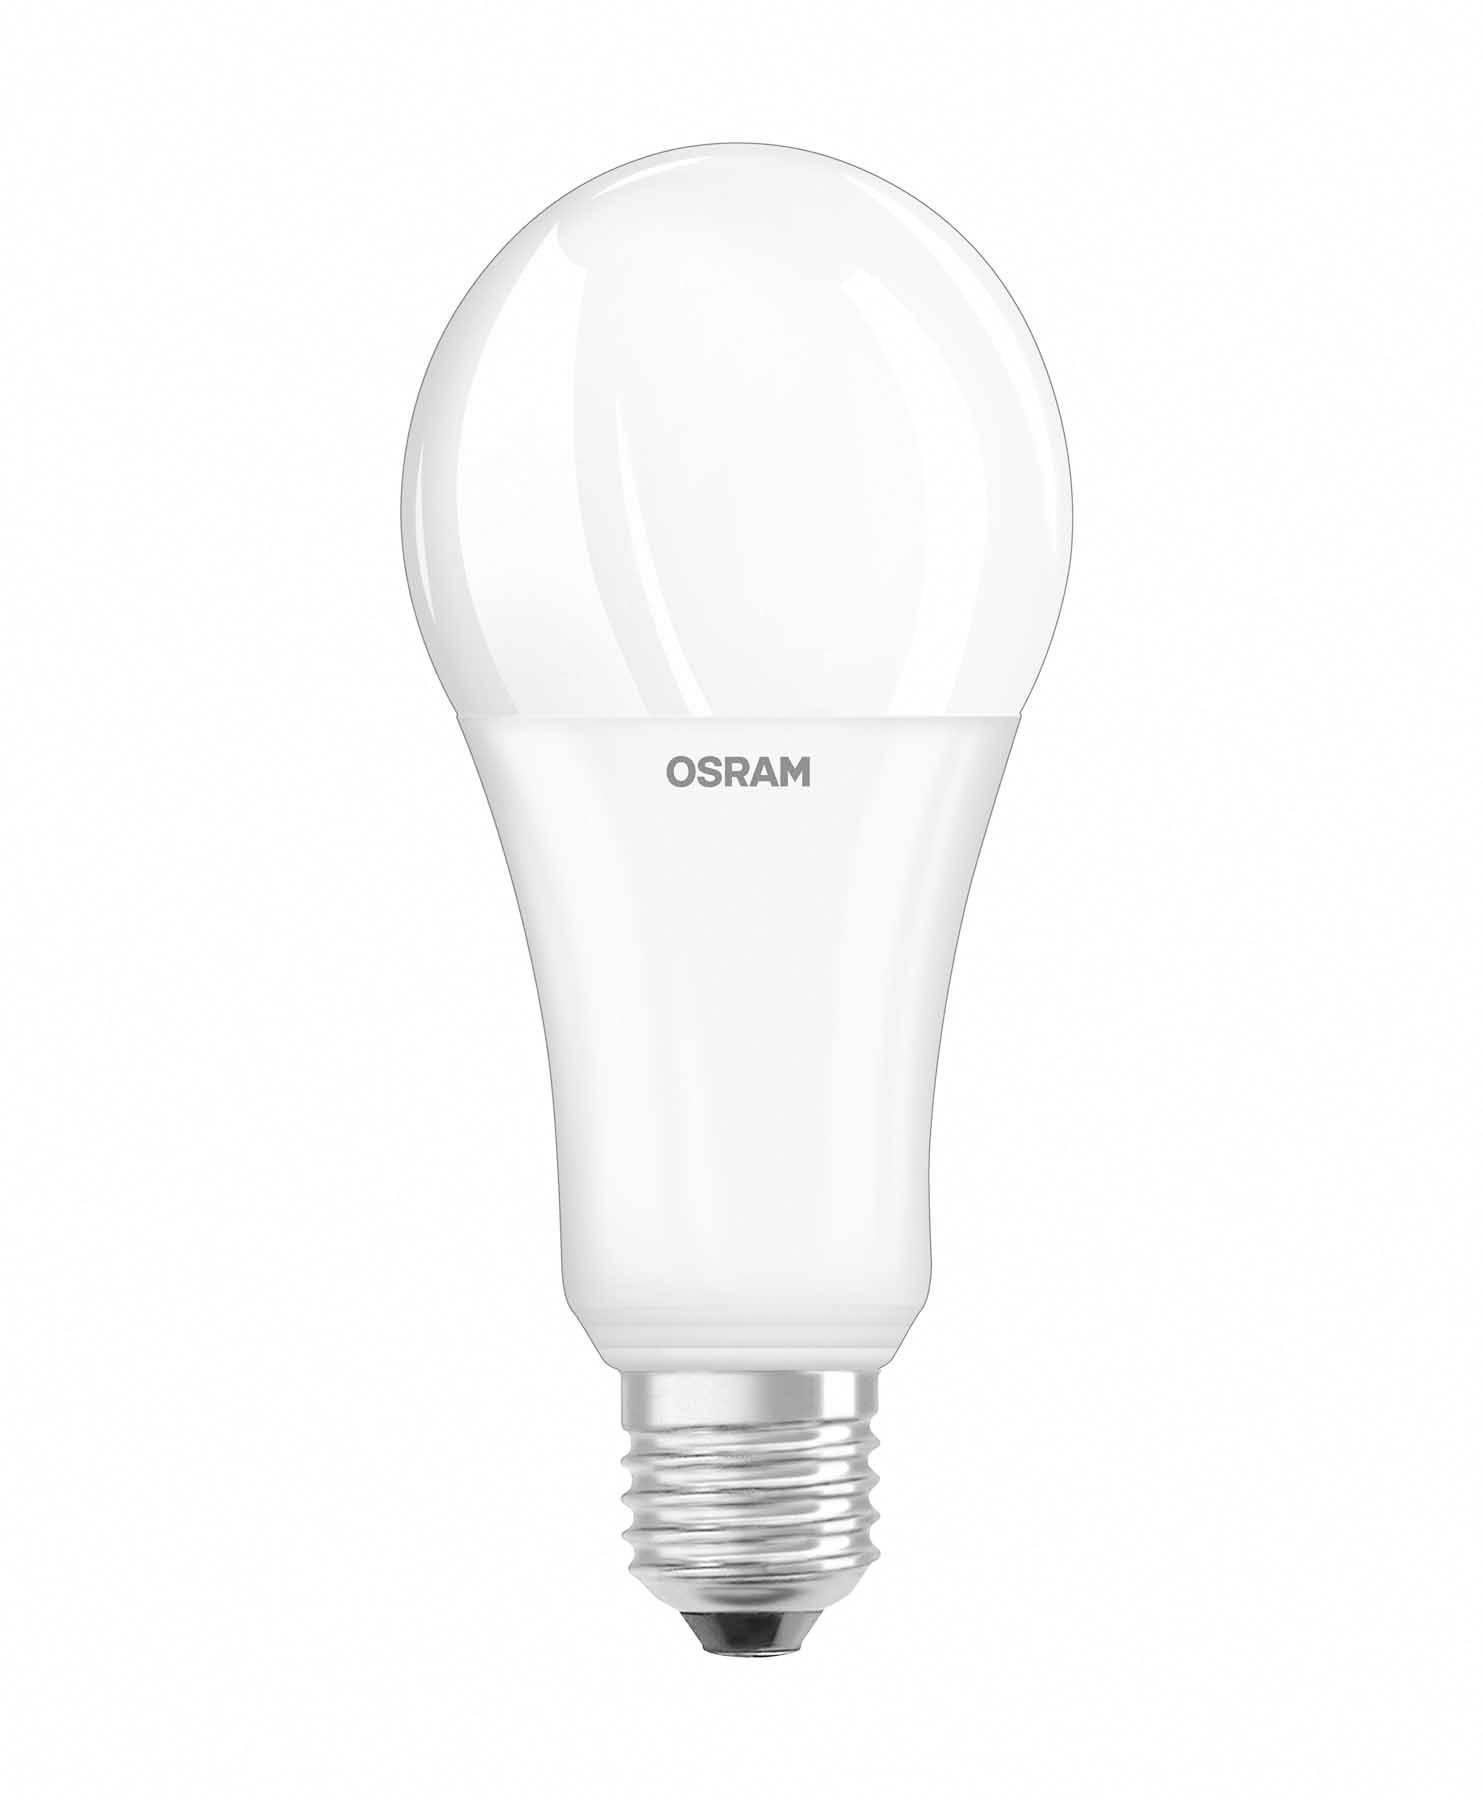 osram 4052899959651 led lamp e27 peer 21 w 150 w warmwit dimbaar energielabel a a e 1 stuks